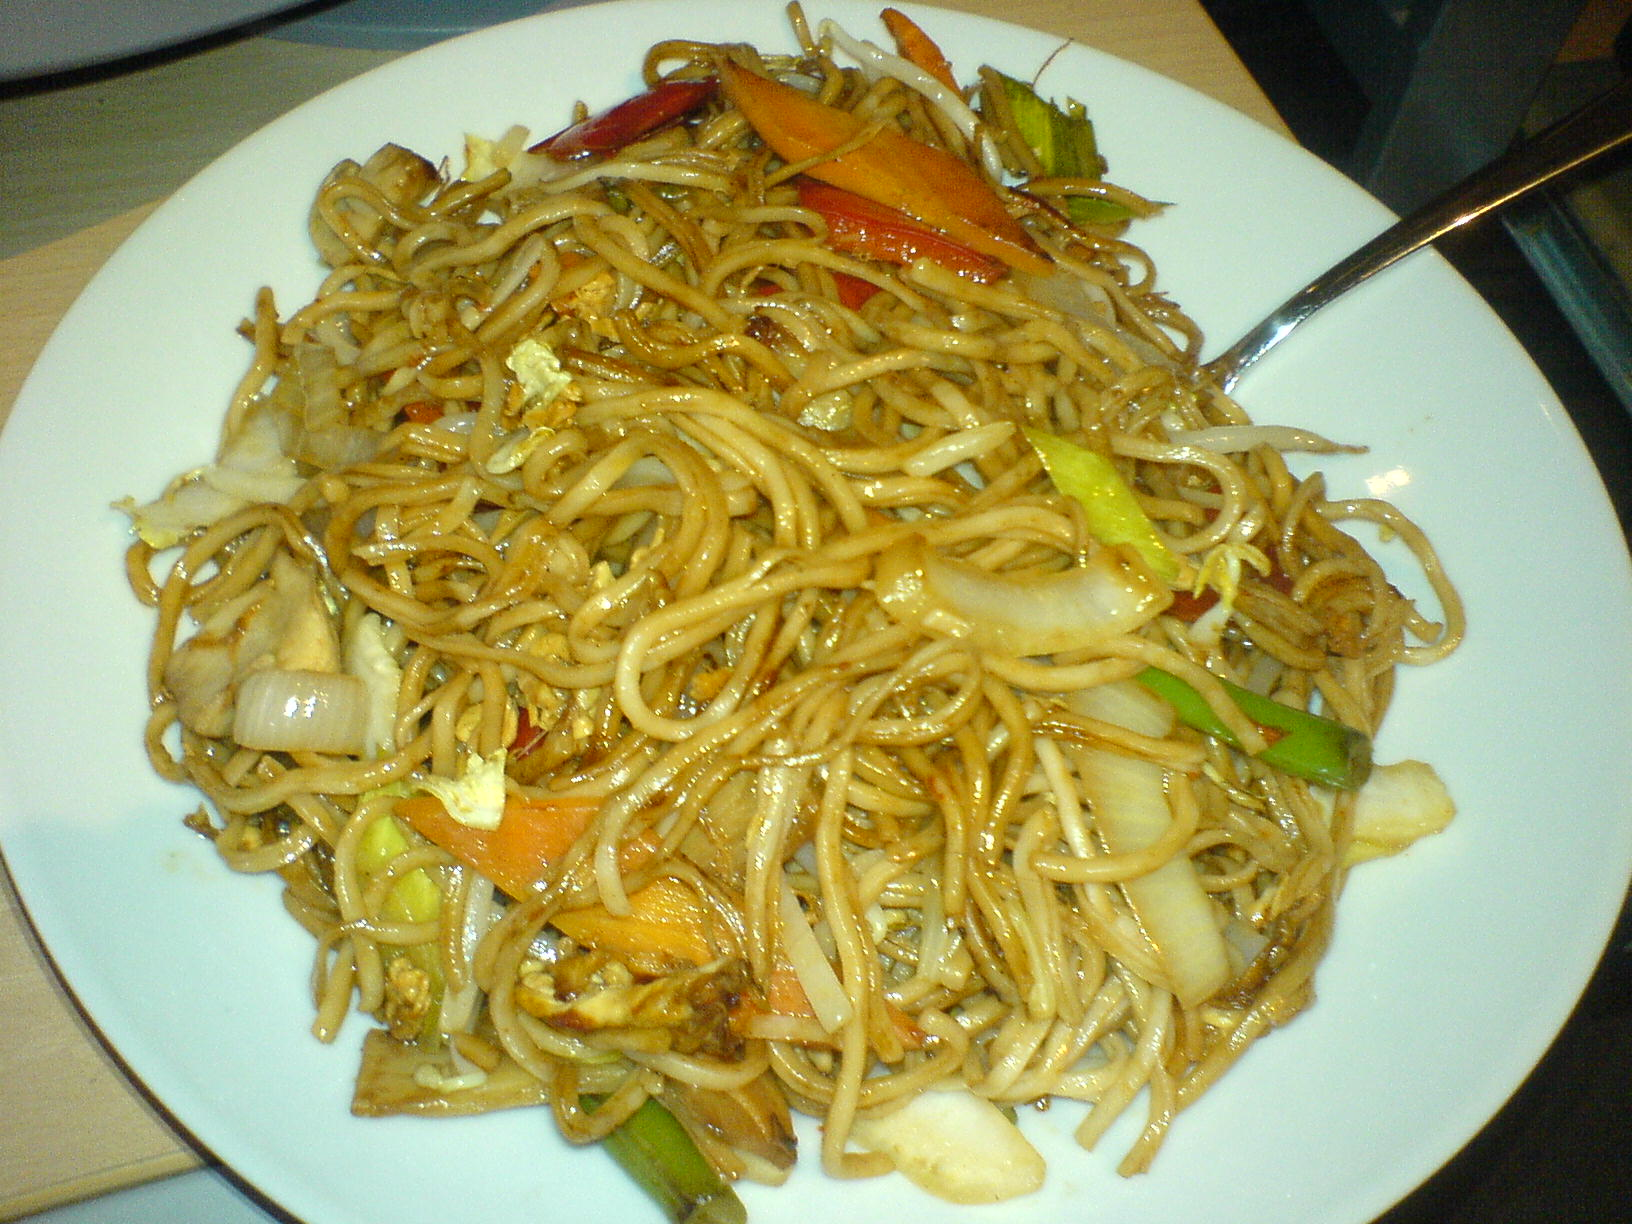 http://foodloader.net/Holz_2009-02-07_Asianudeln.jpg